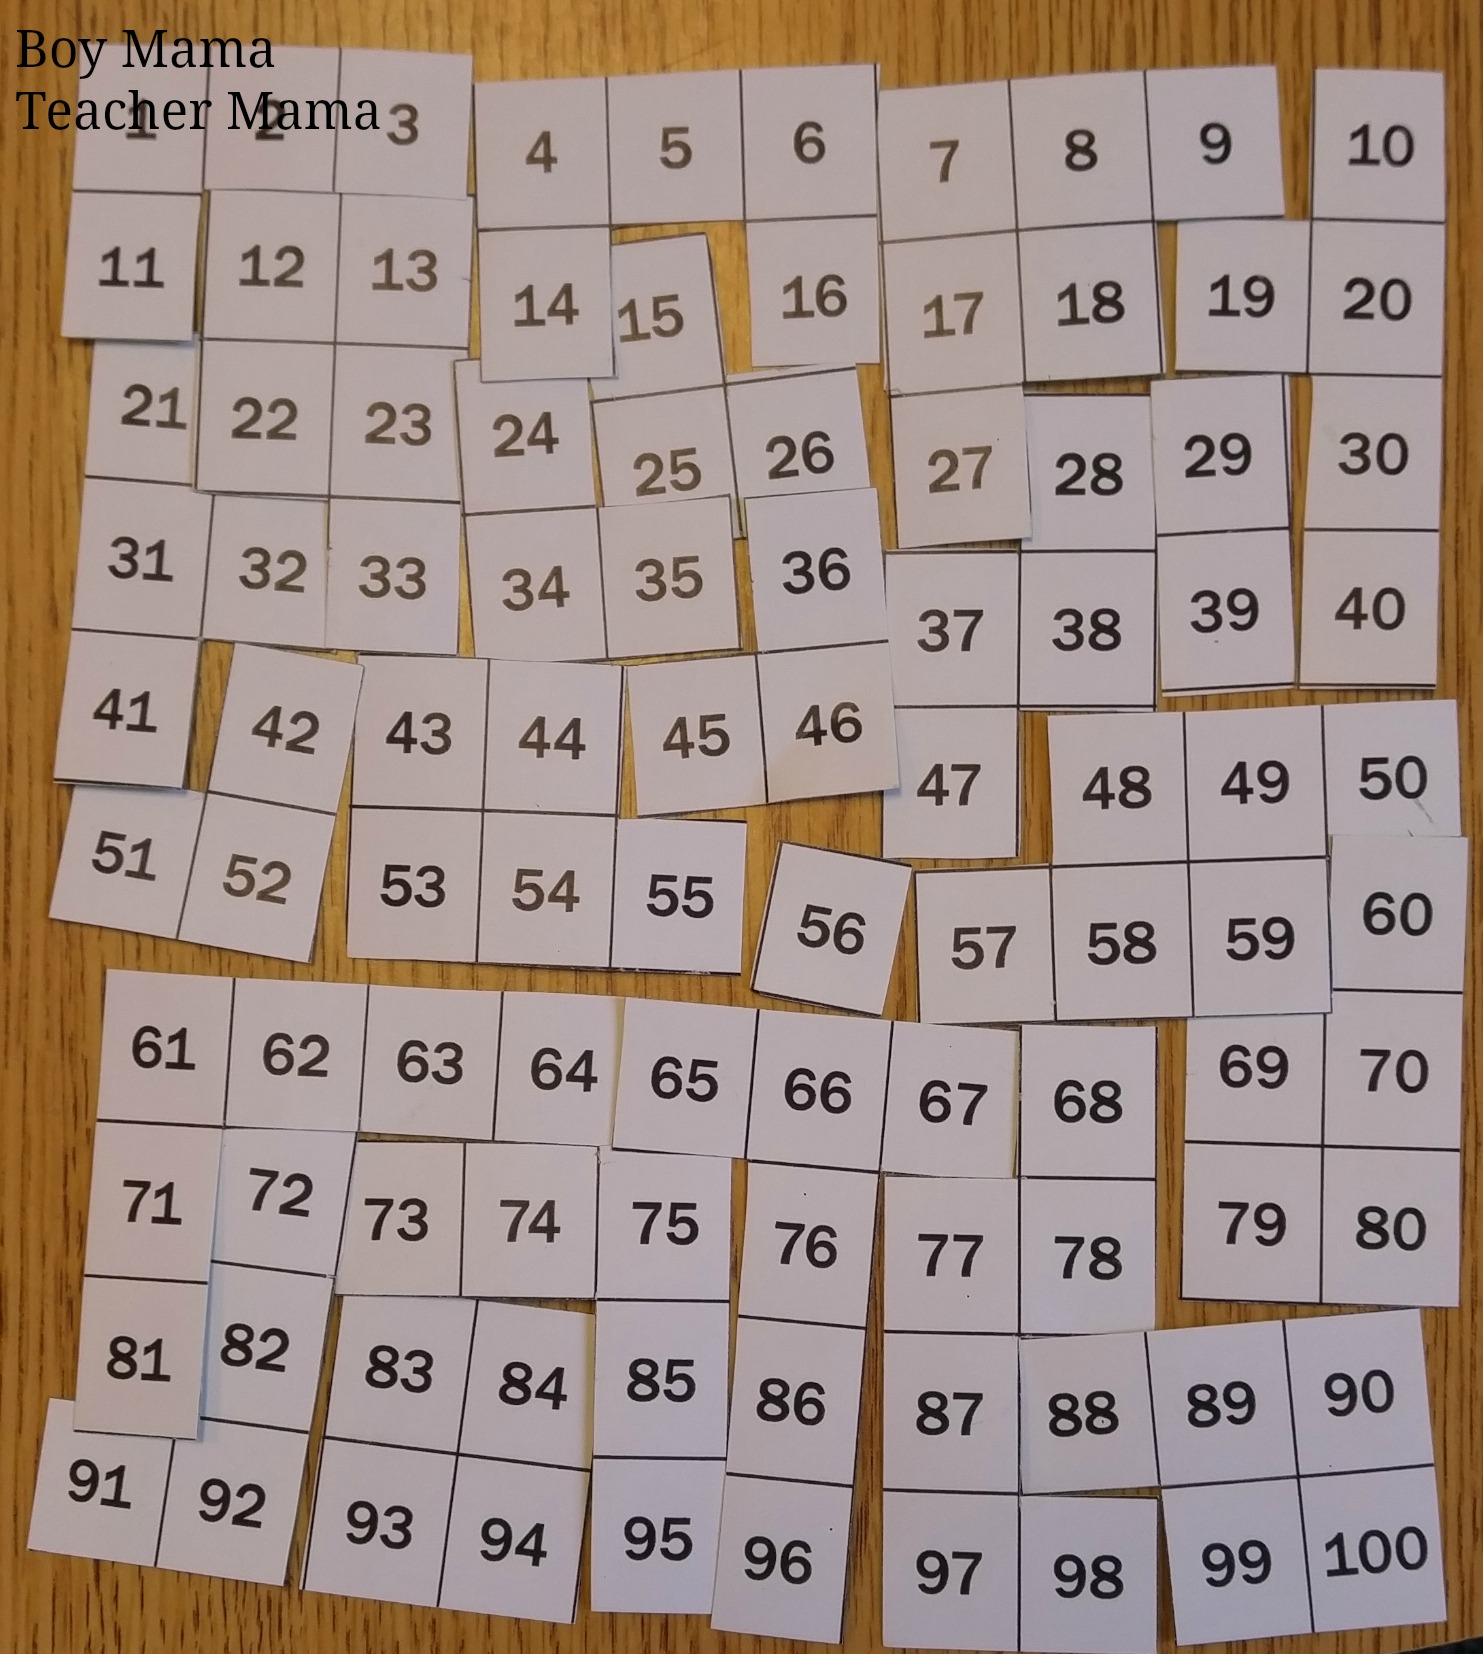 Boy Mama Teacher Mama 100s Chart Puzzles 5